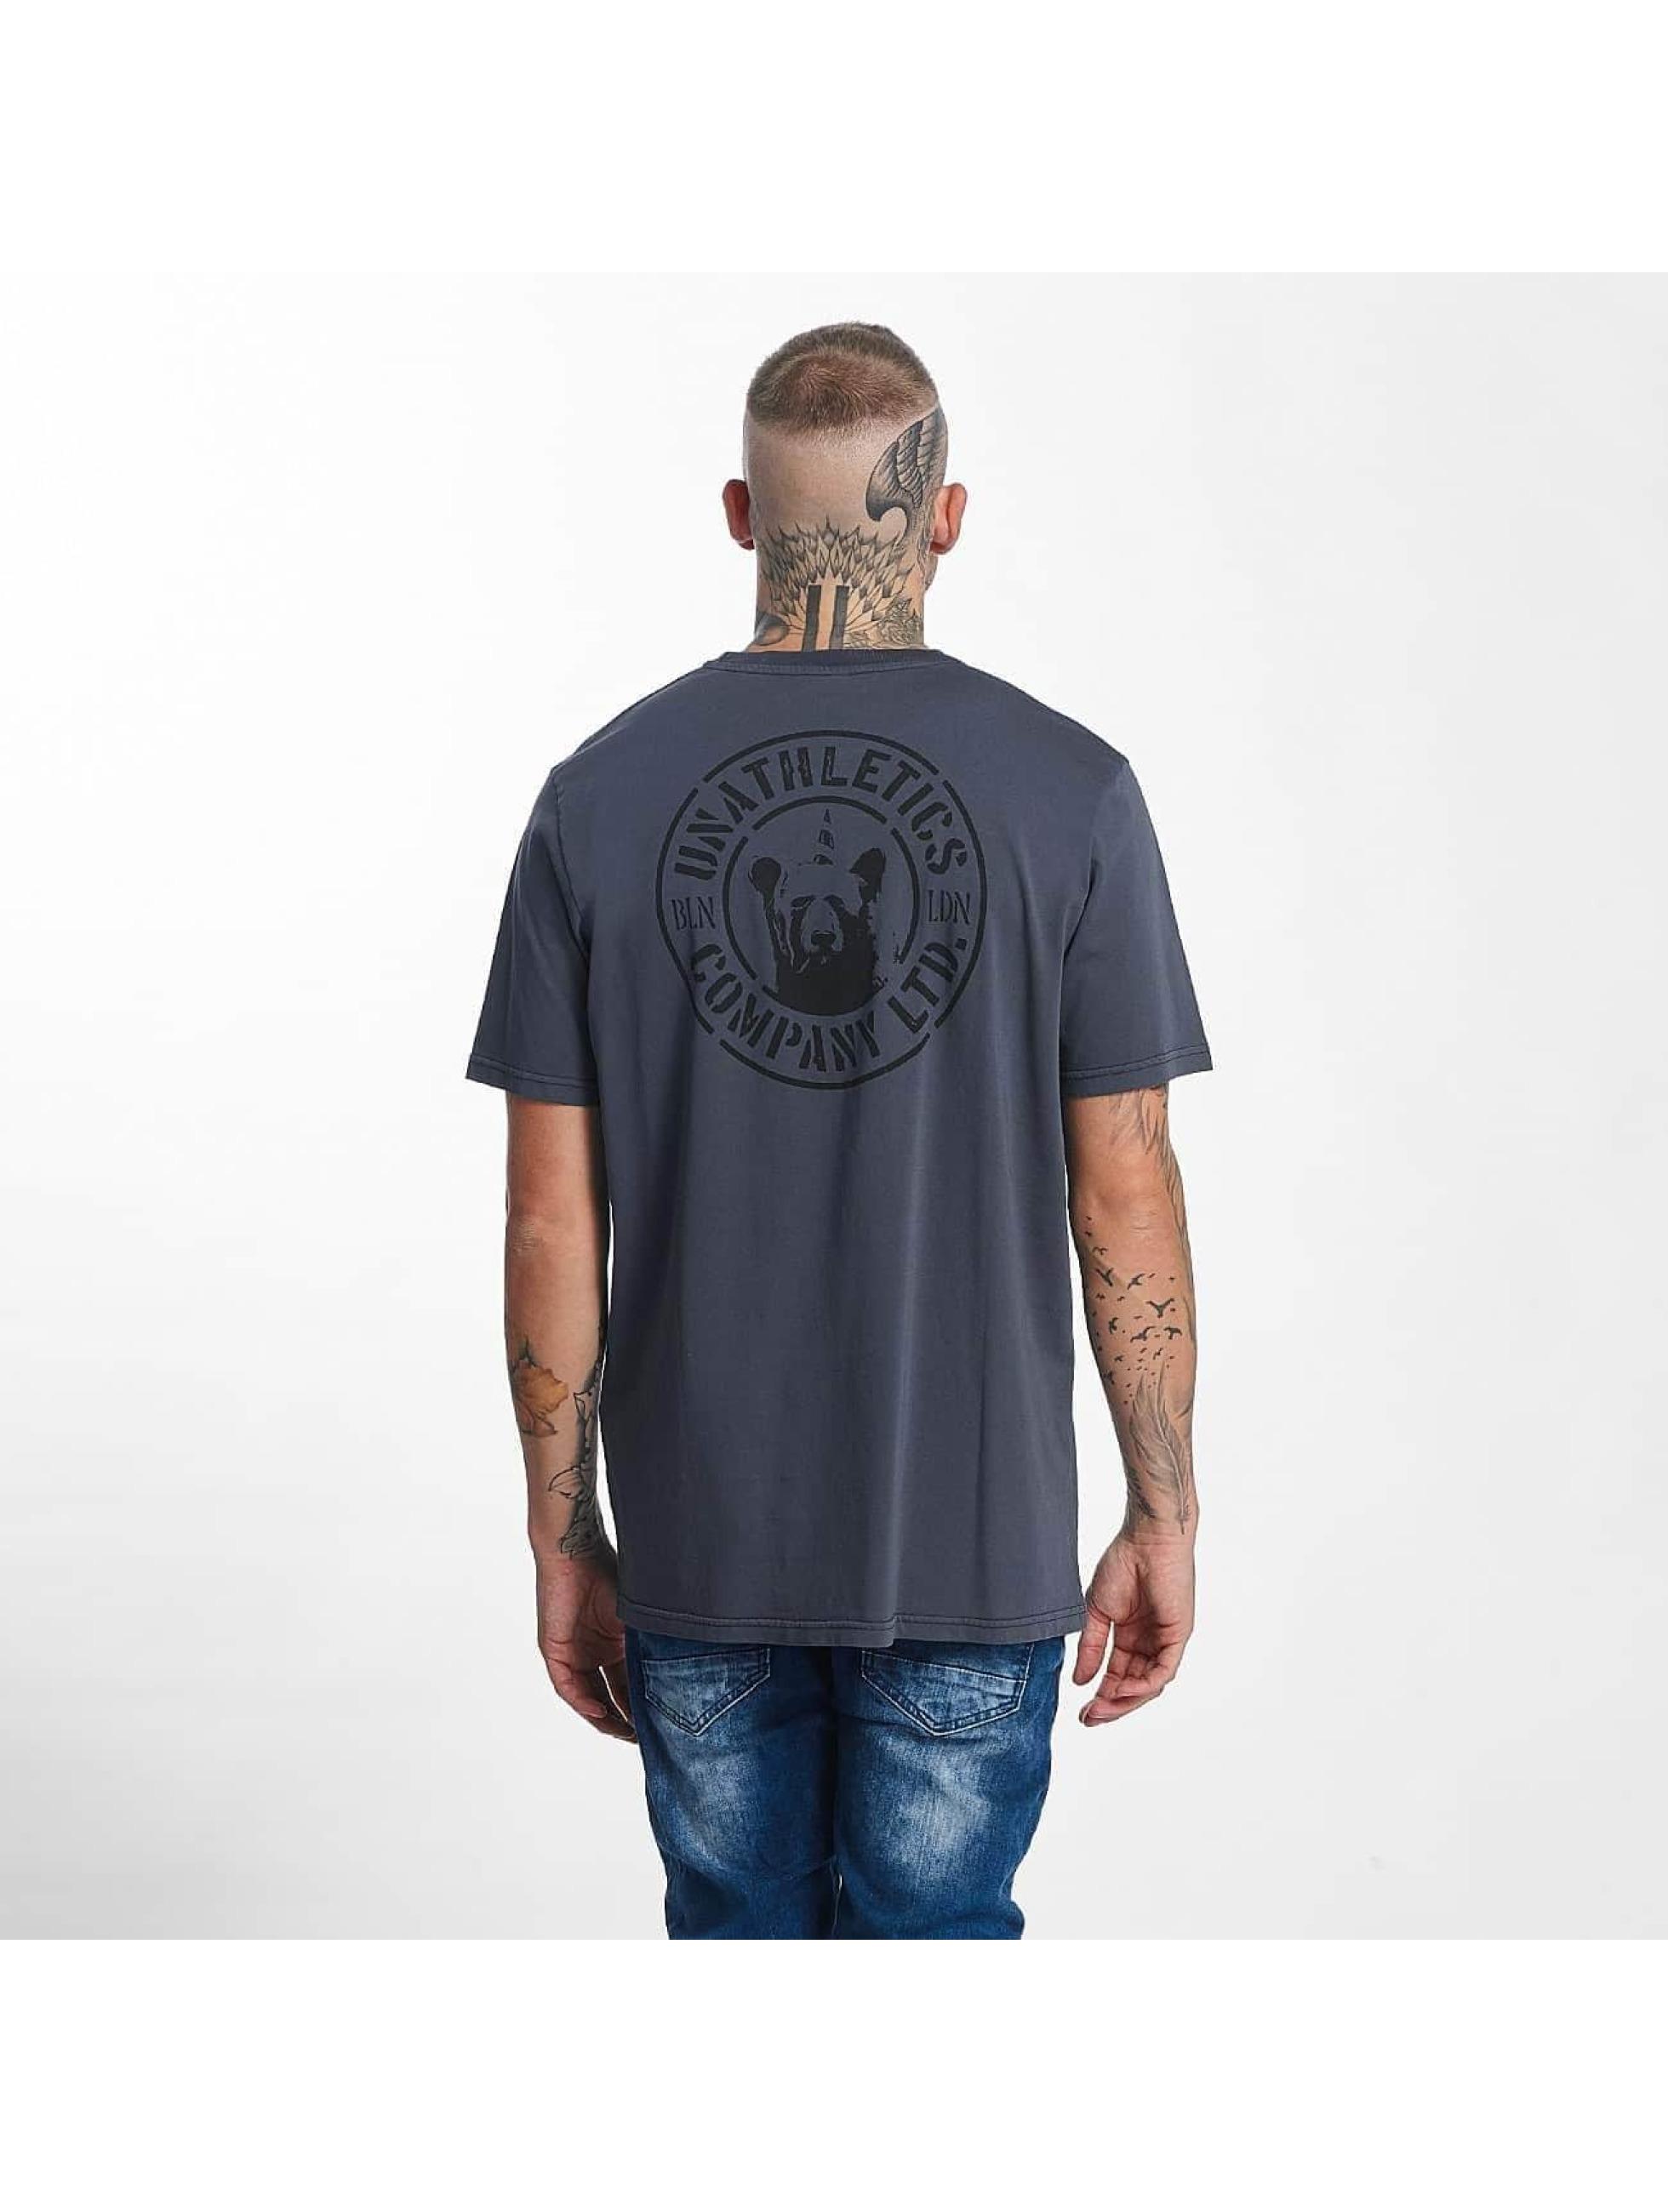 The Dudes Männer T-Shirt Unathletics Company in grau